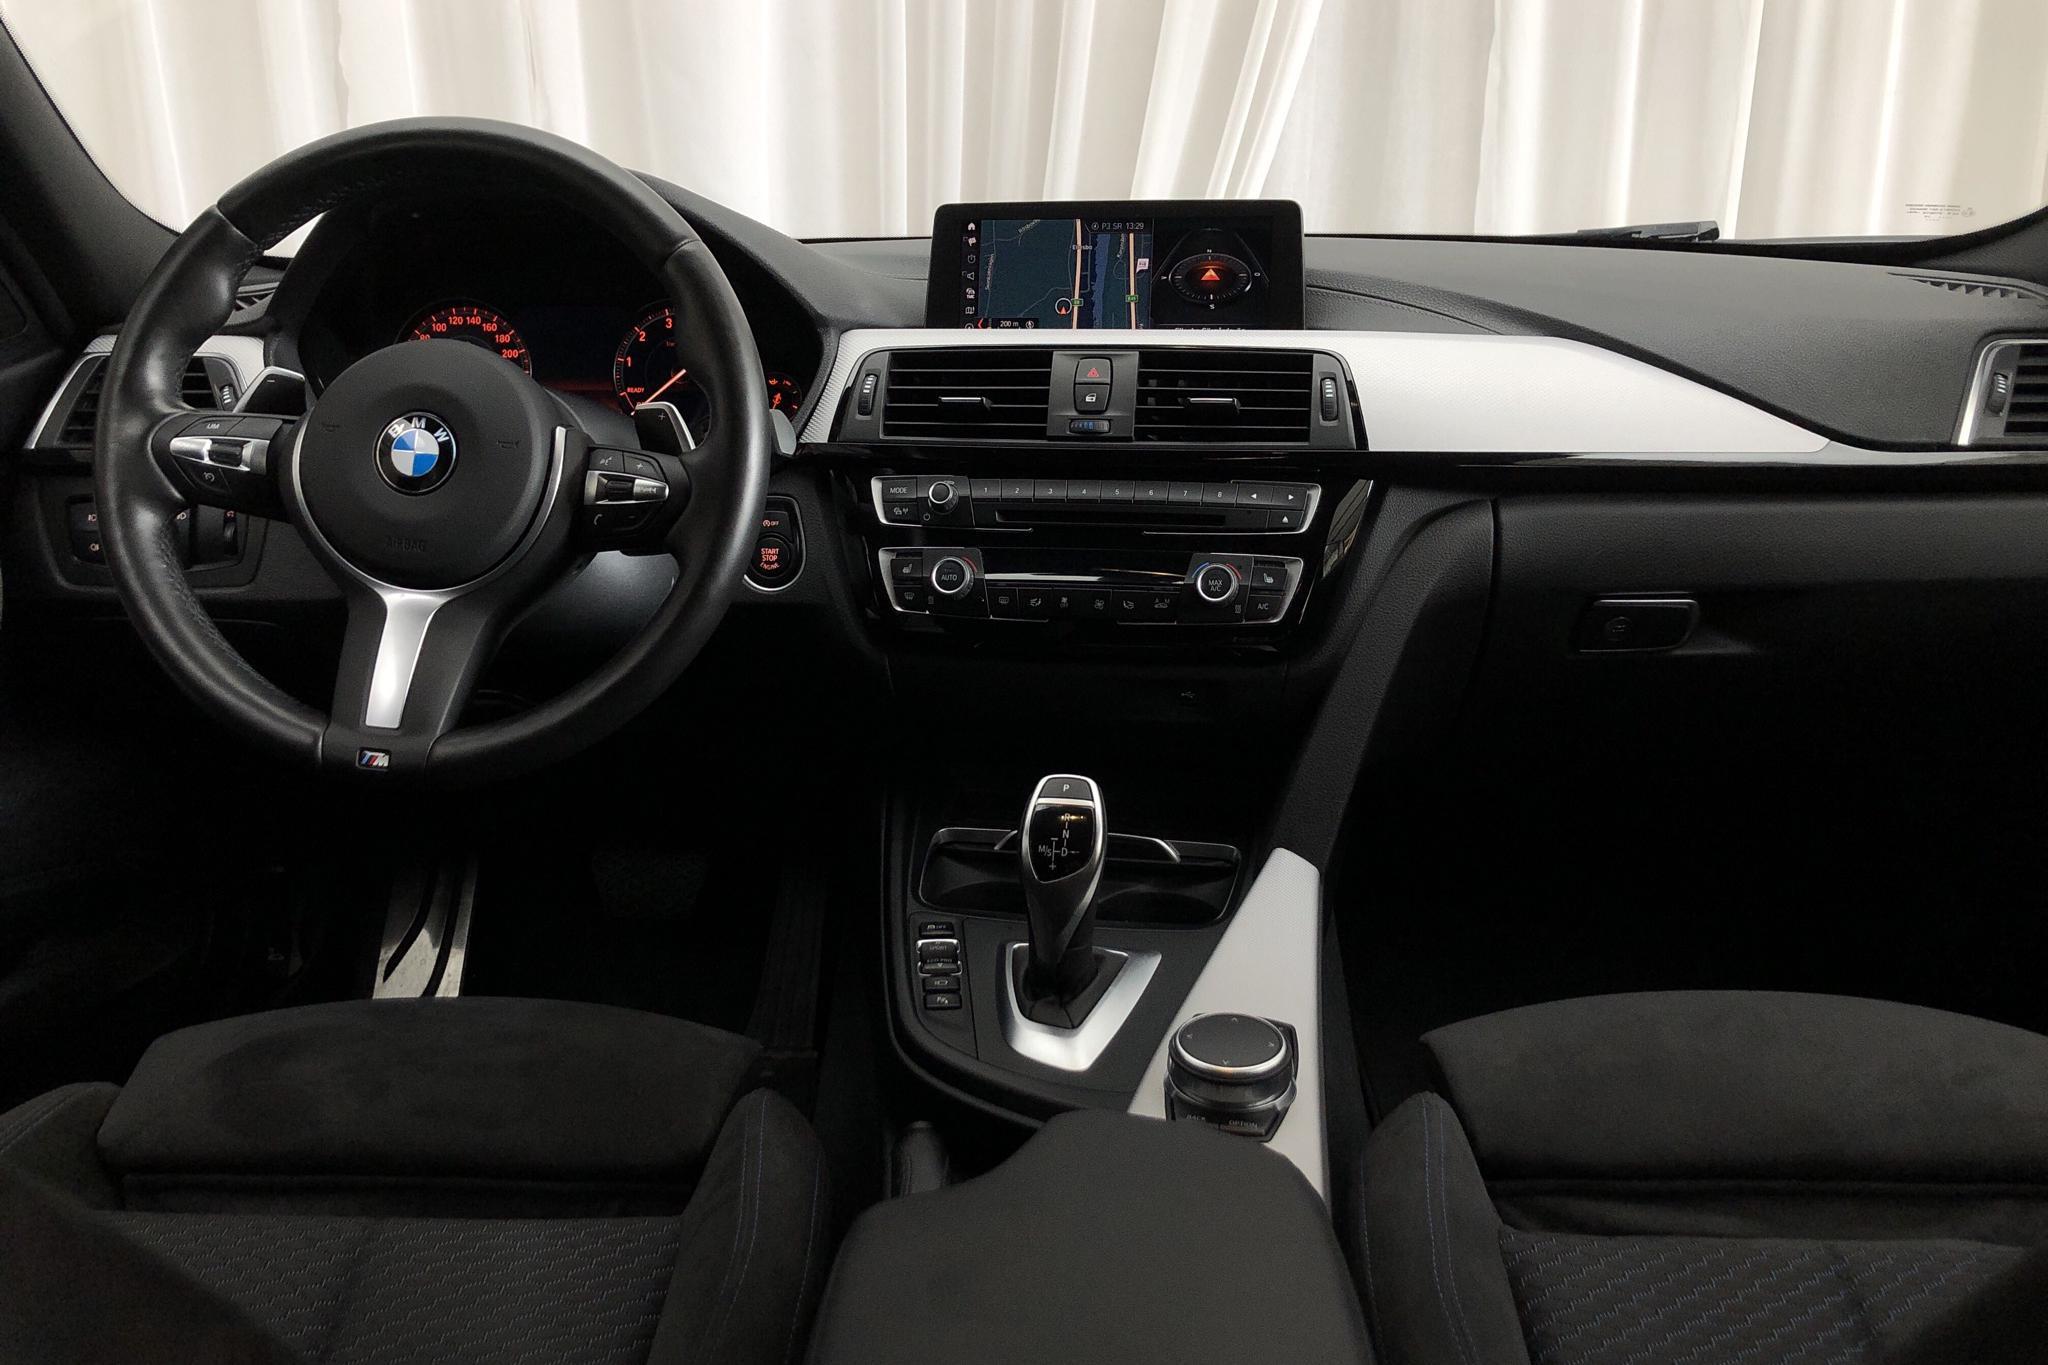 BMW 330i xDrive Touring, F31 (252hk) - 49 600 km - Automatic - black - 2018